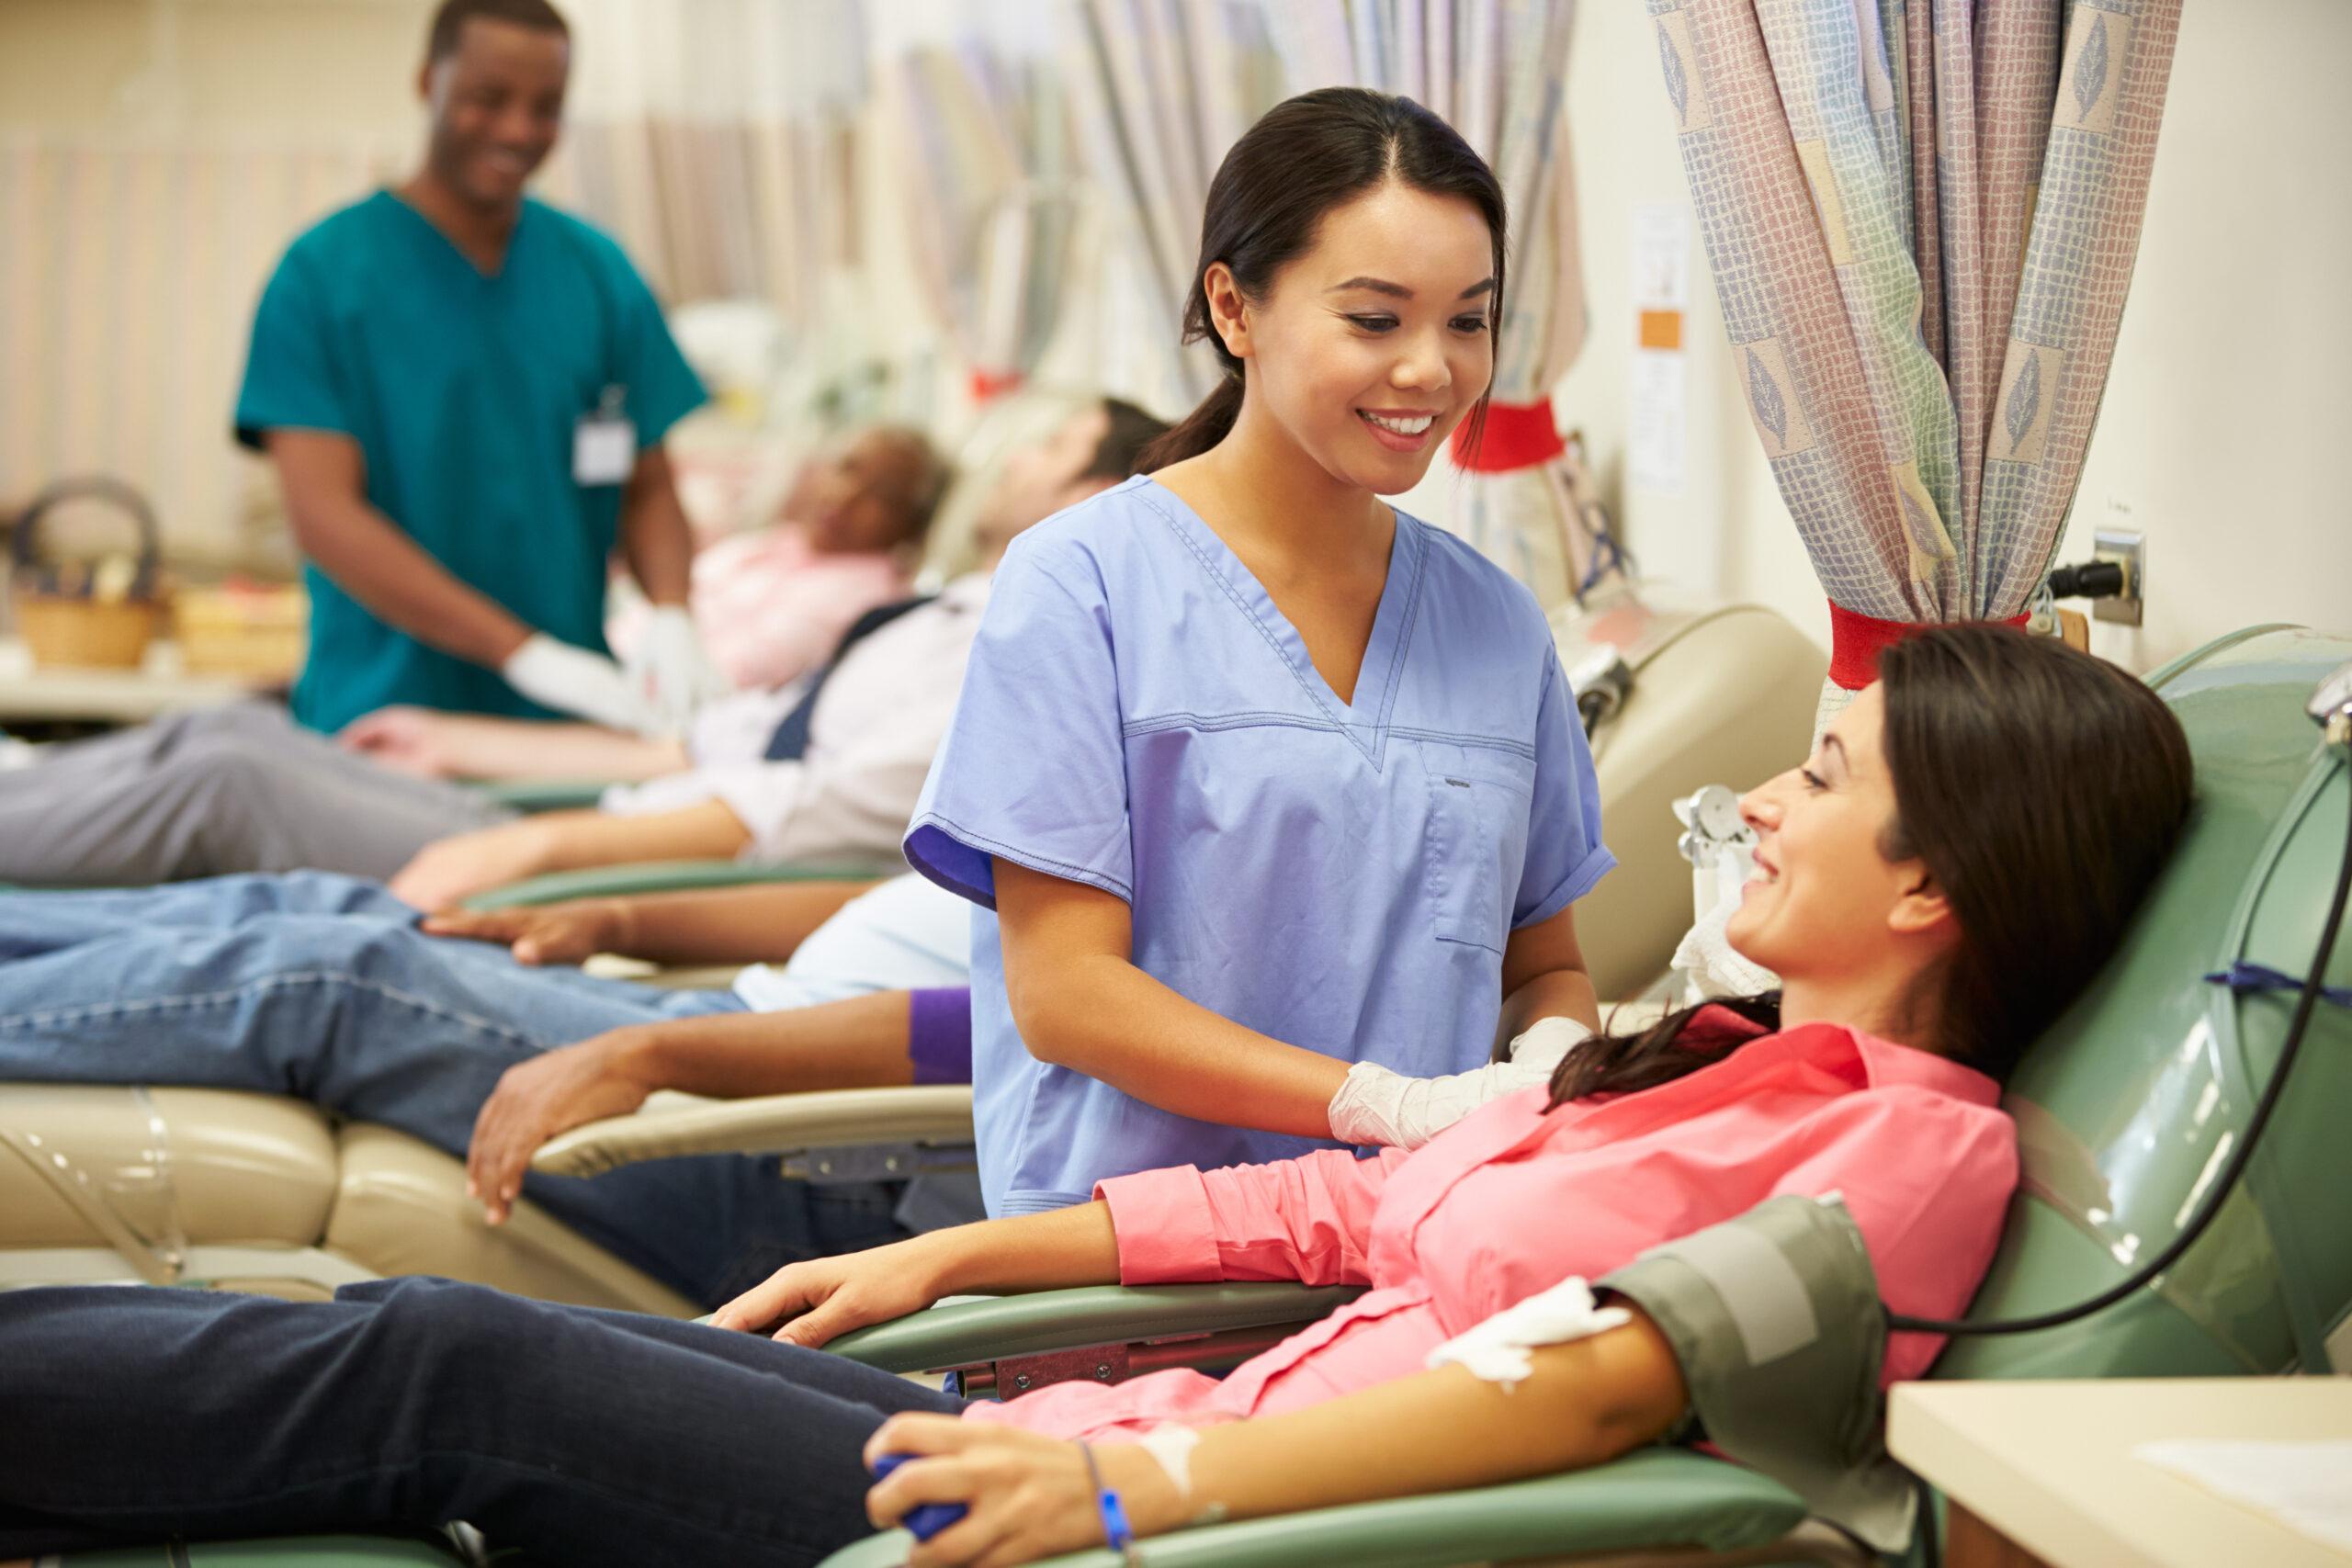 blood donation, nurse, hospital, patient, donate, blood donor, donate blood, platelet donation, blood supply critically low,